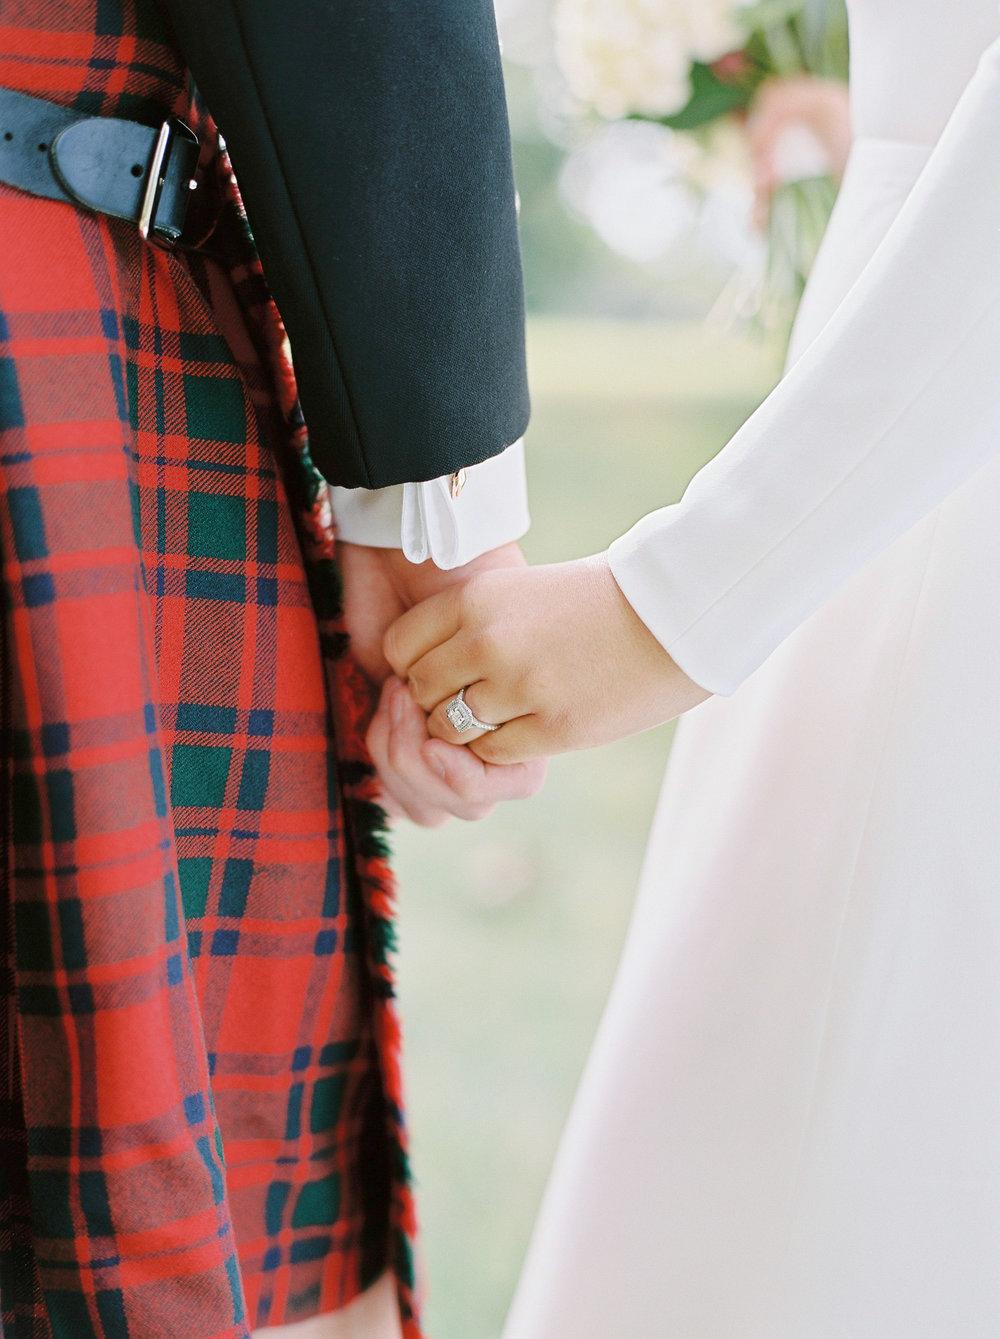 0292-Geneva-Ian-Wedding-Toronto Golf Club-When He Found Her-TorontoPhotographer.jpg